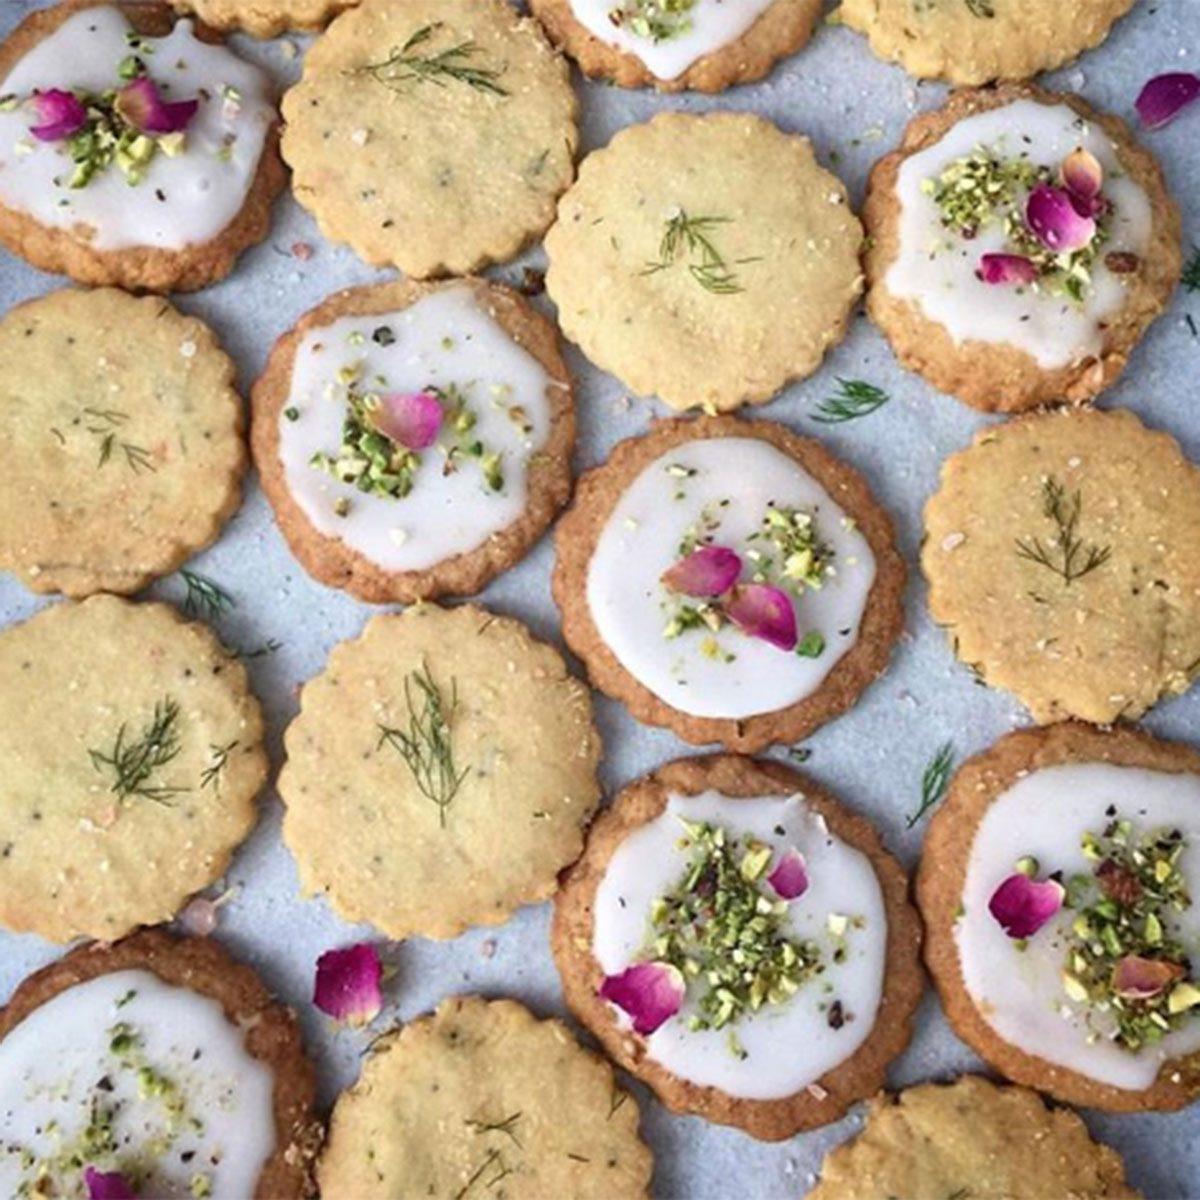 Shortbread cookies with petals